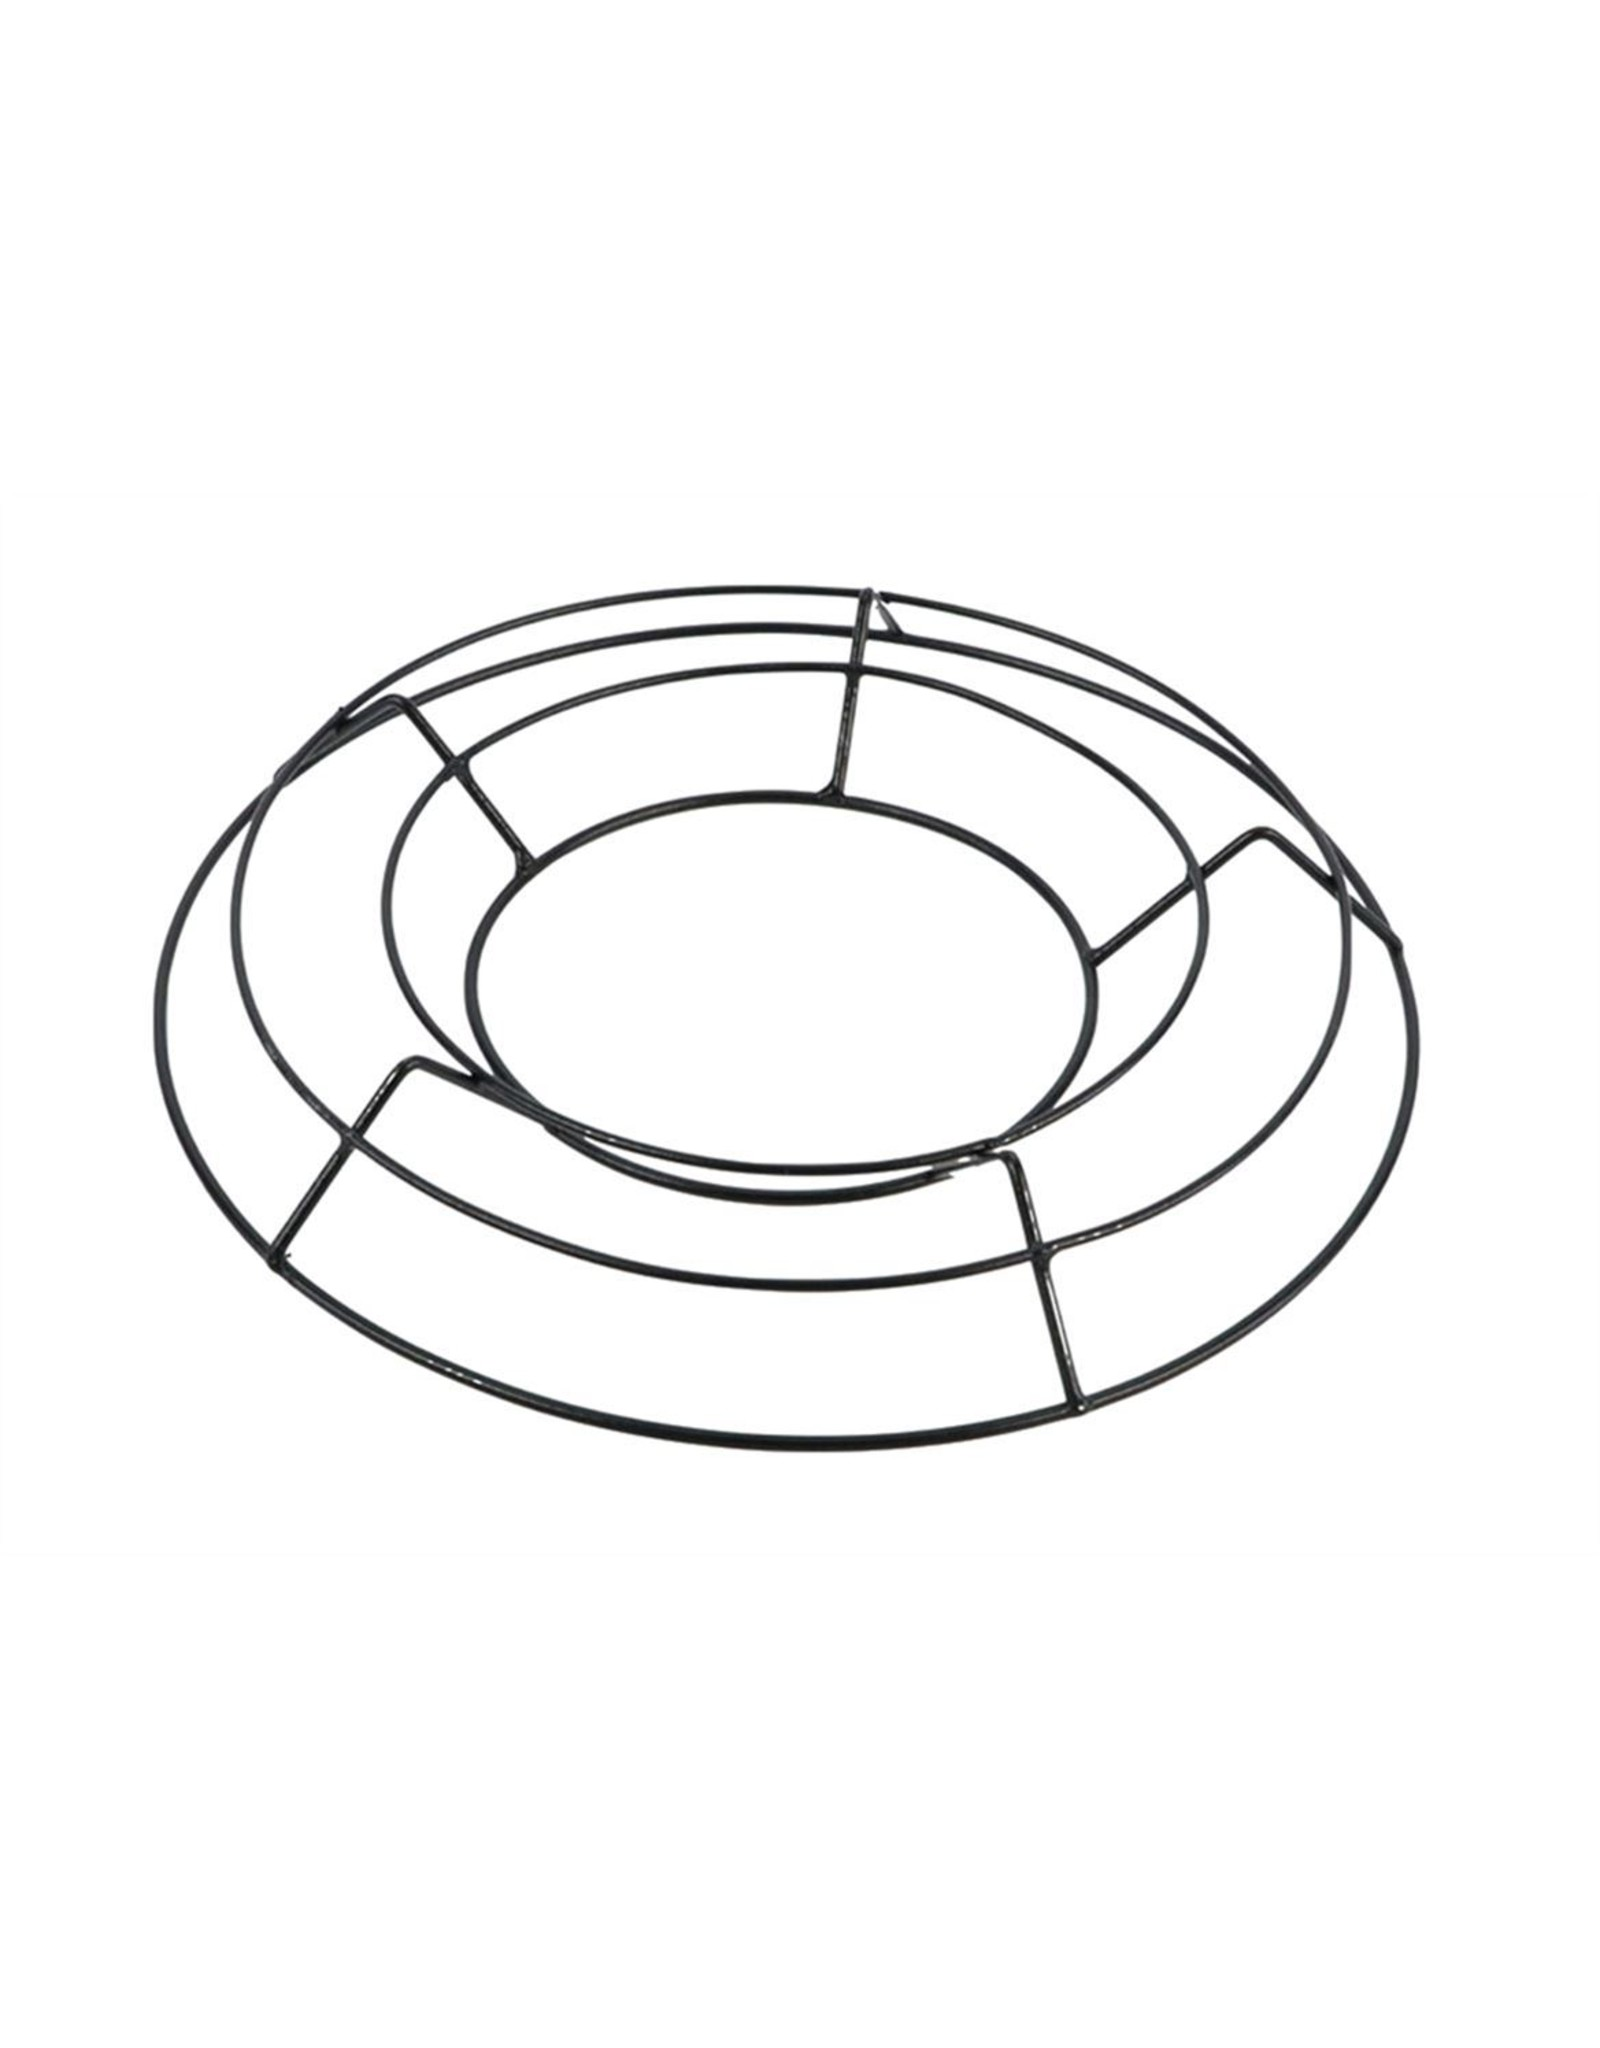 HD Basic Ring Floral D25.0h3.0 x 30